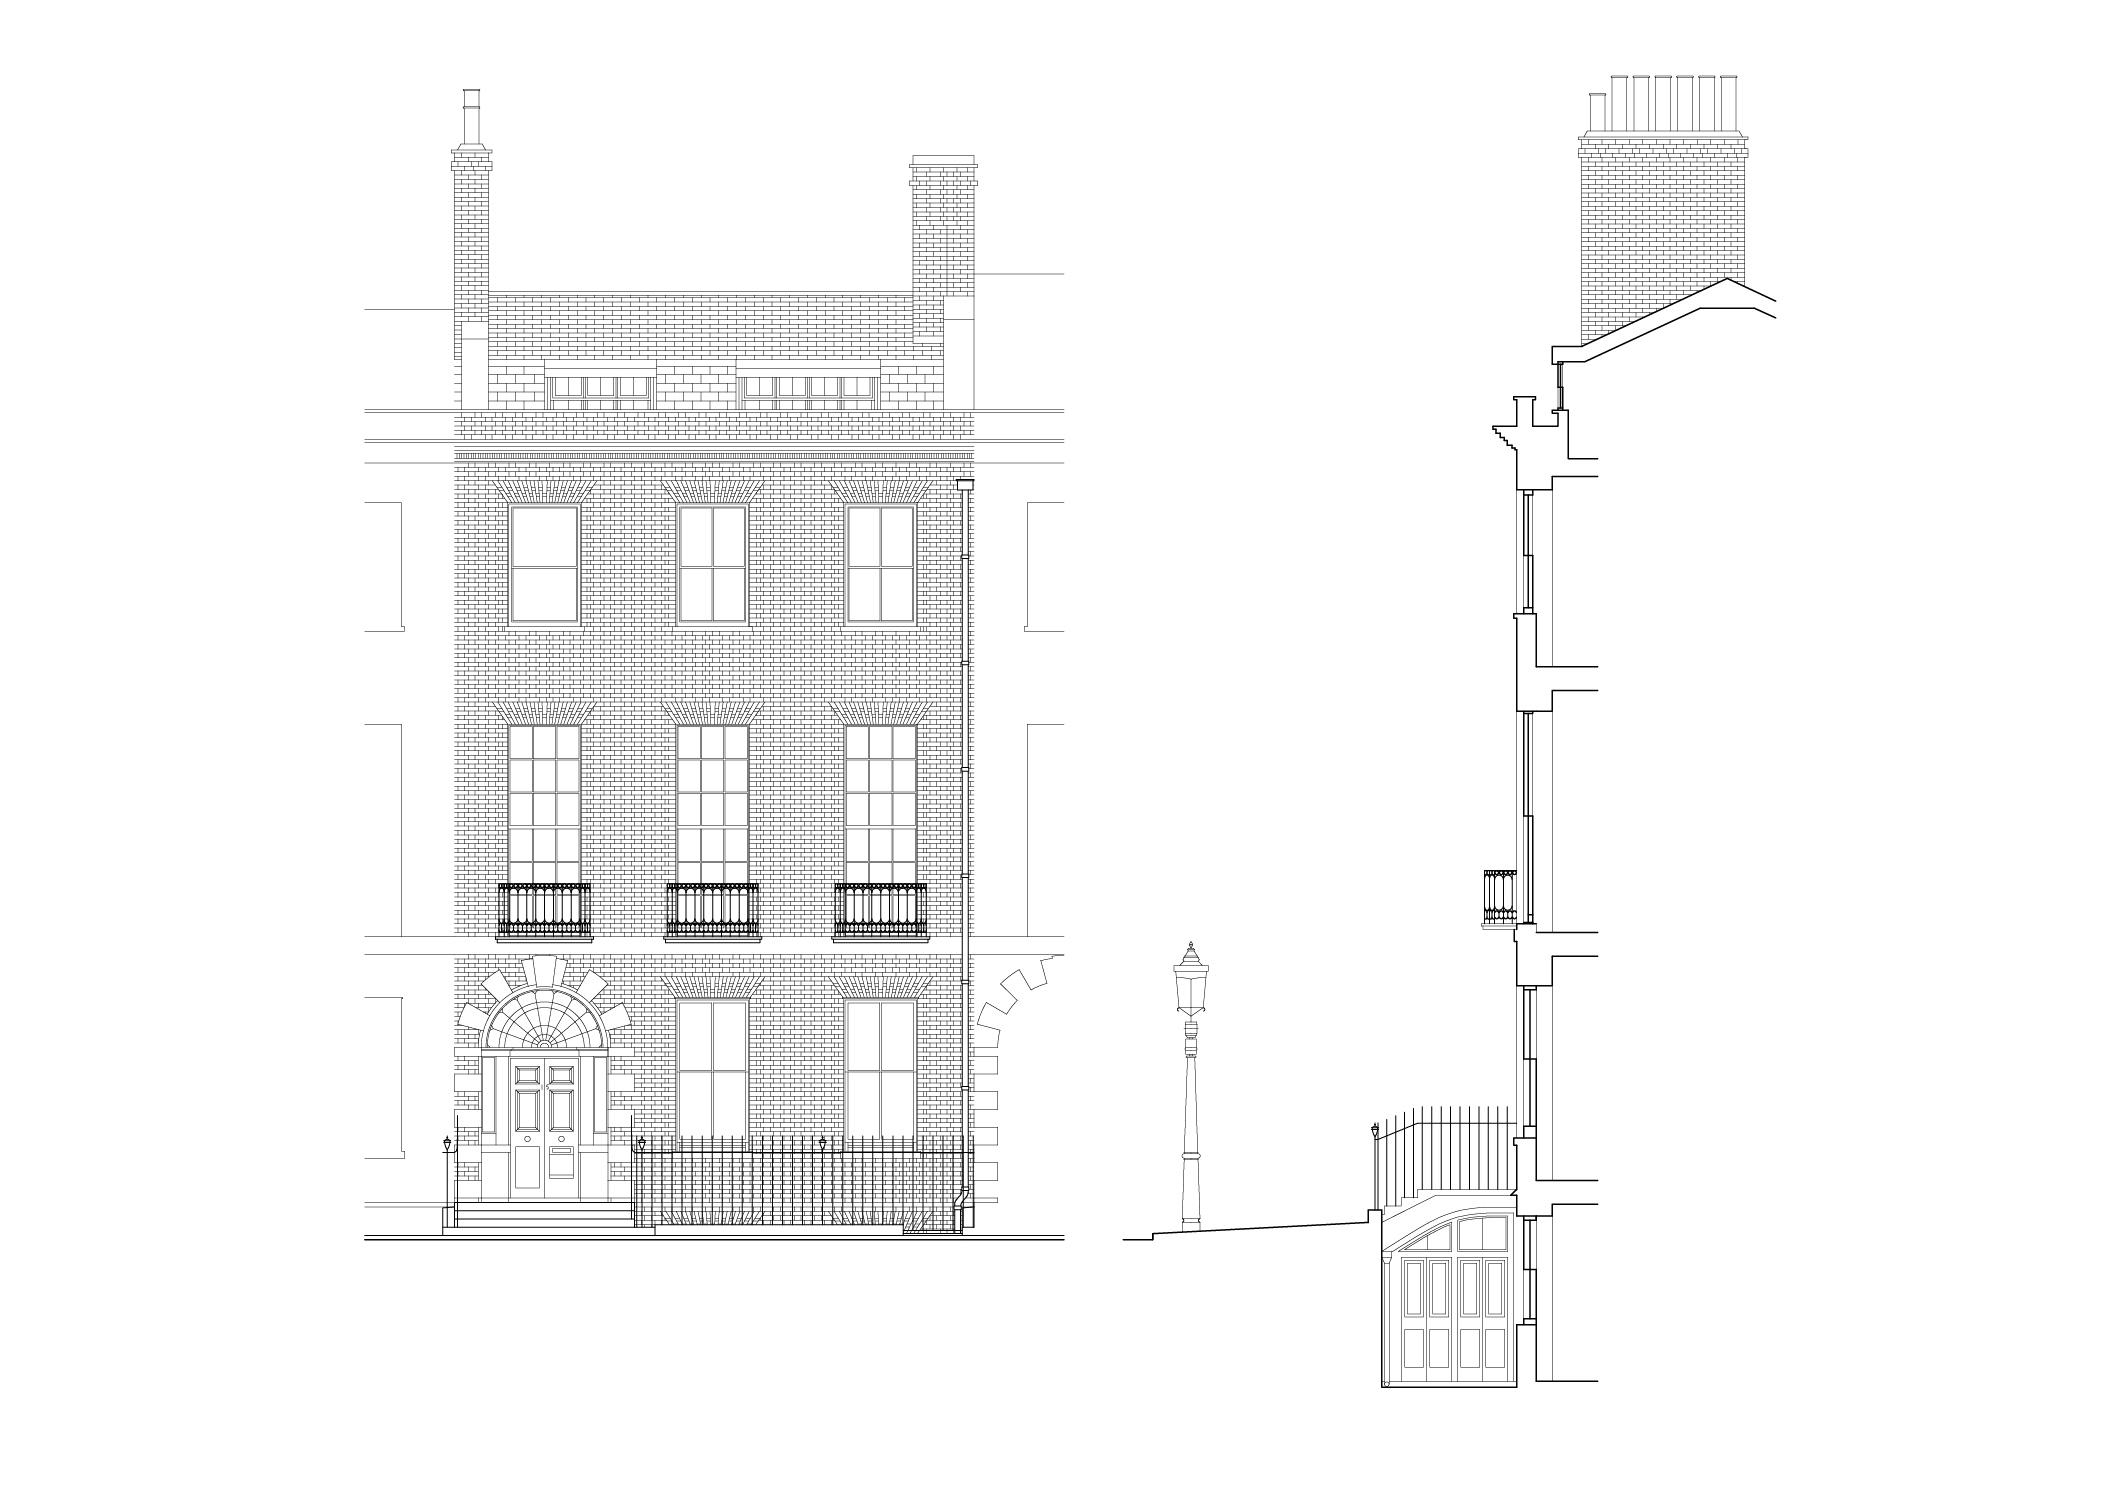 Bedford Square nr. 15.